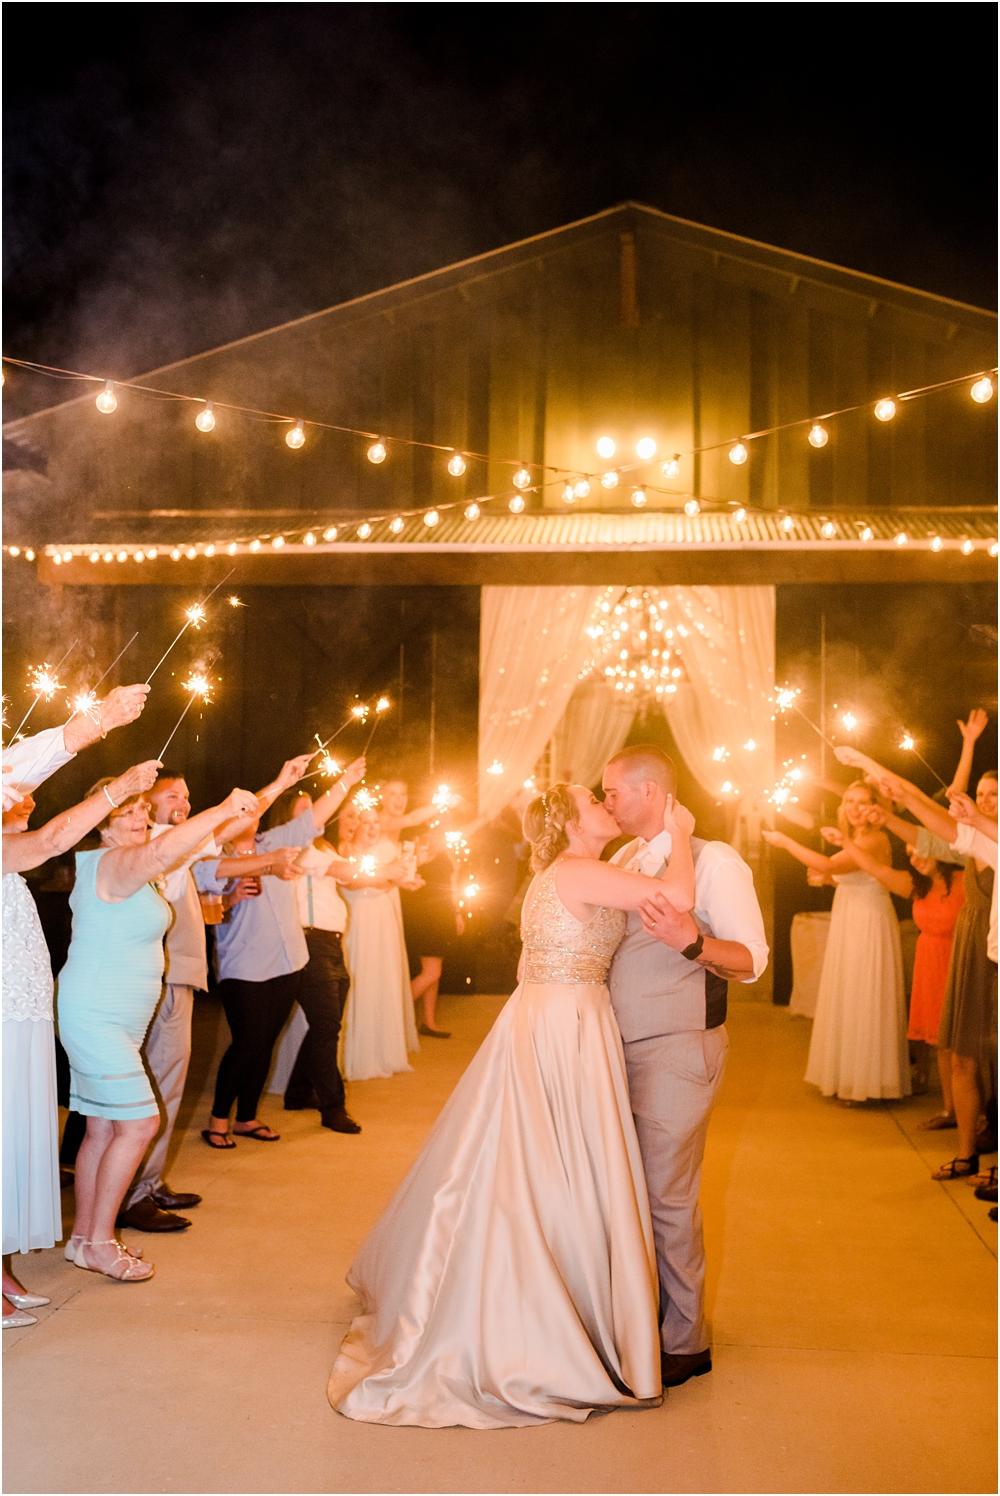 matthew-wedding-kiersten-stevenson-photography-30a-panama-city-beach-dothan-tallahassee-(484-of-579).JPG